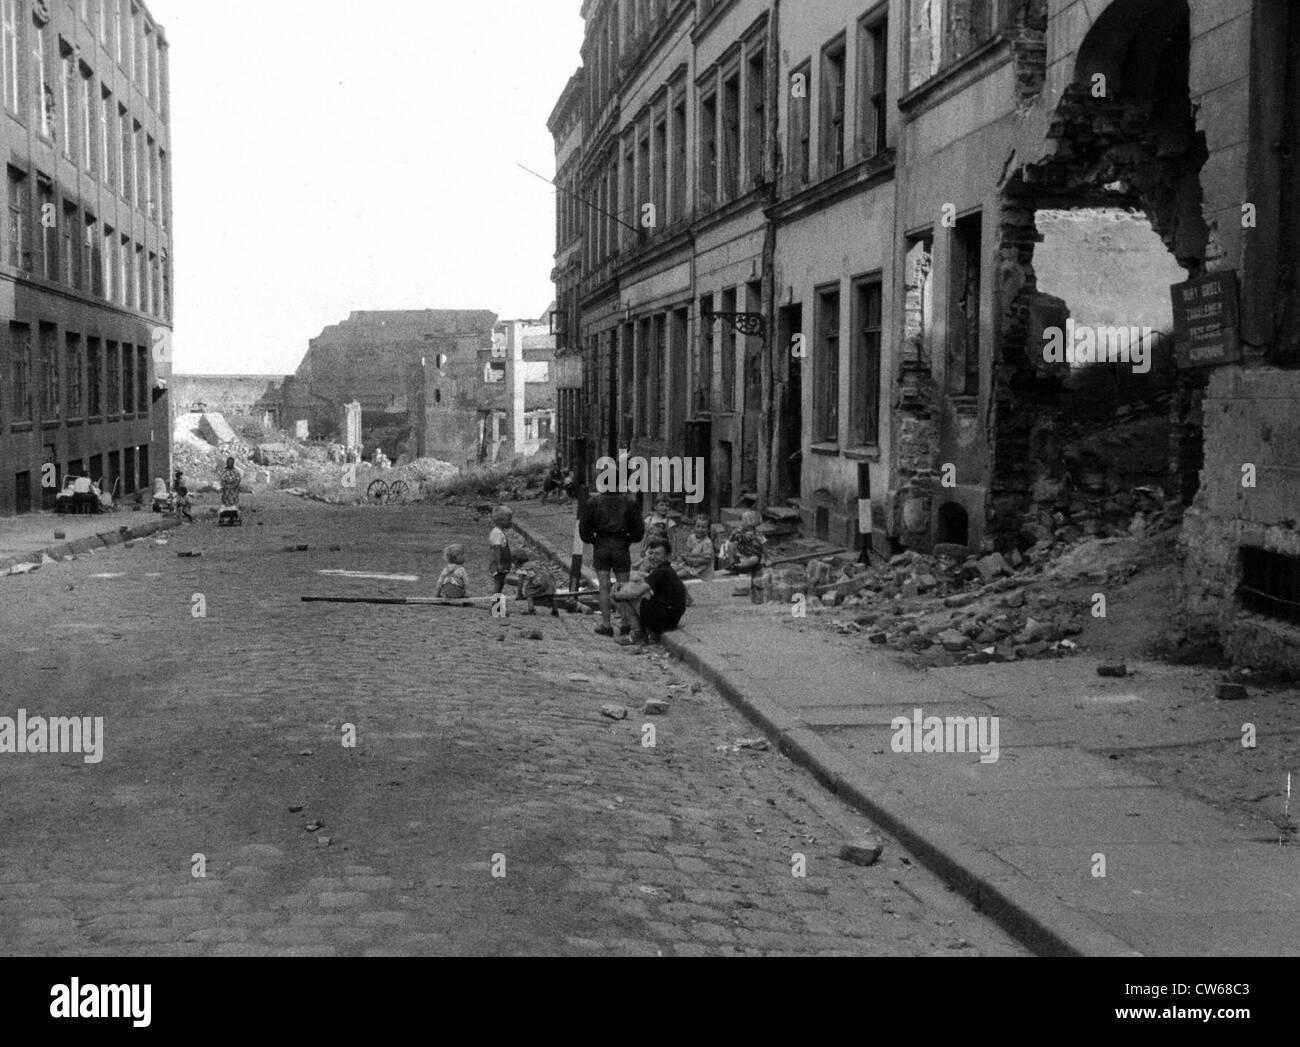 Stettin in pictures STETTIN during the Third Reich NAZI period